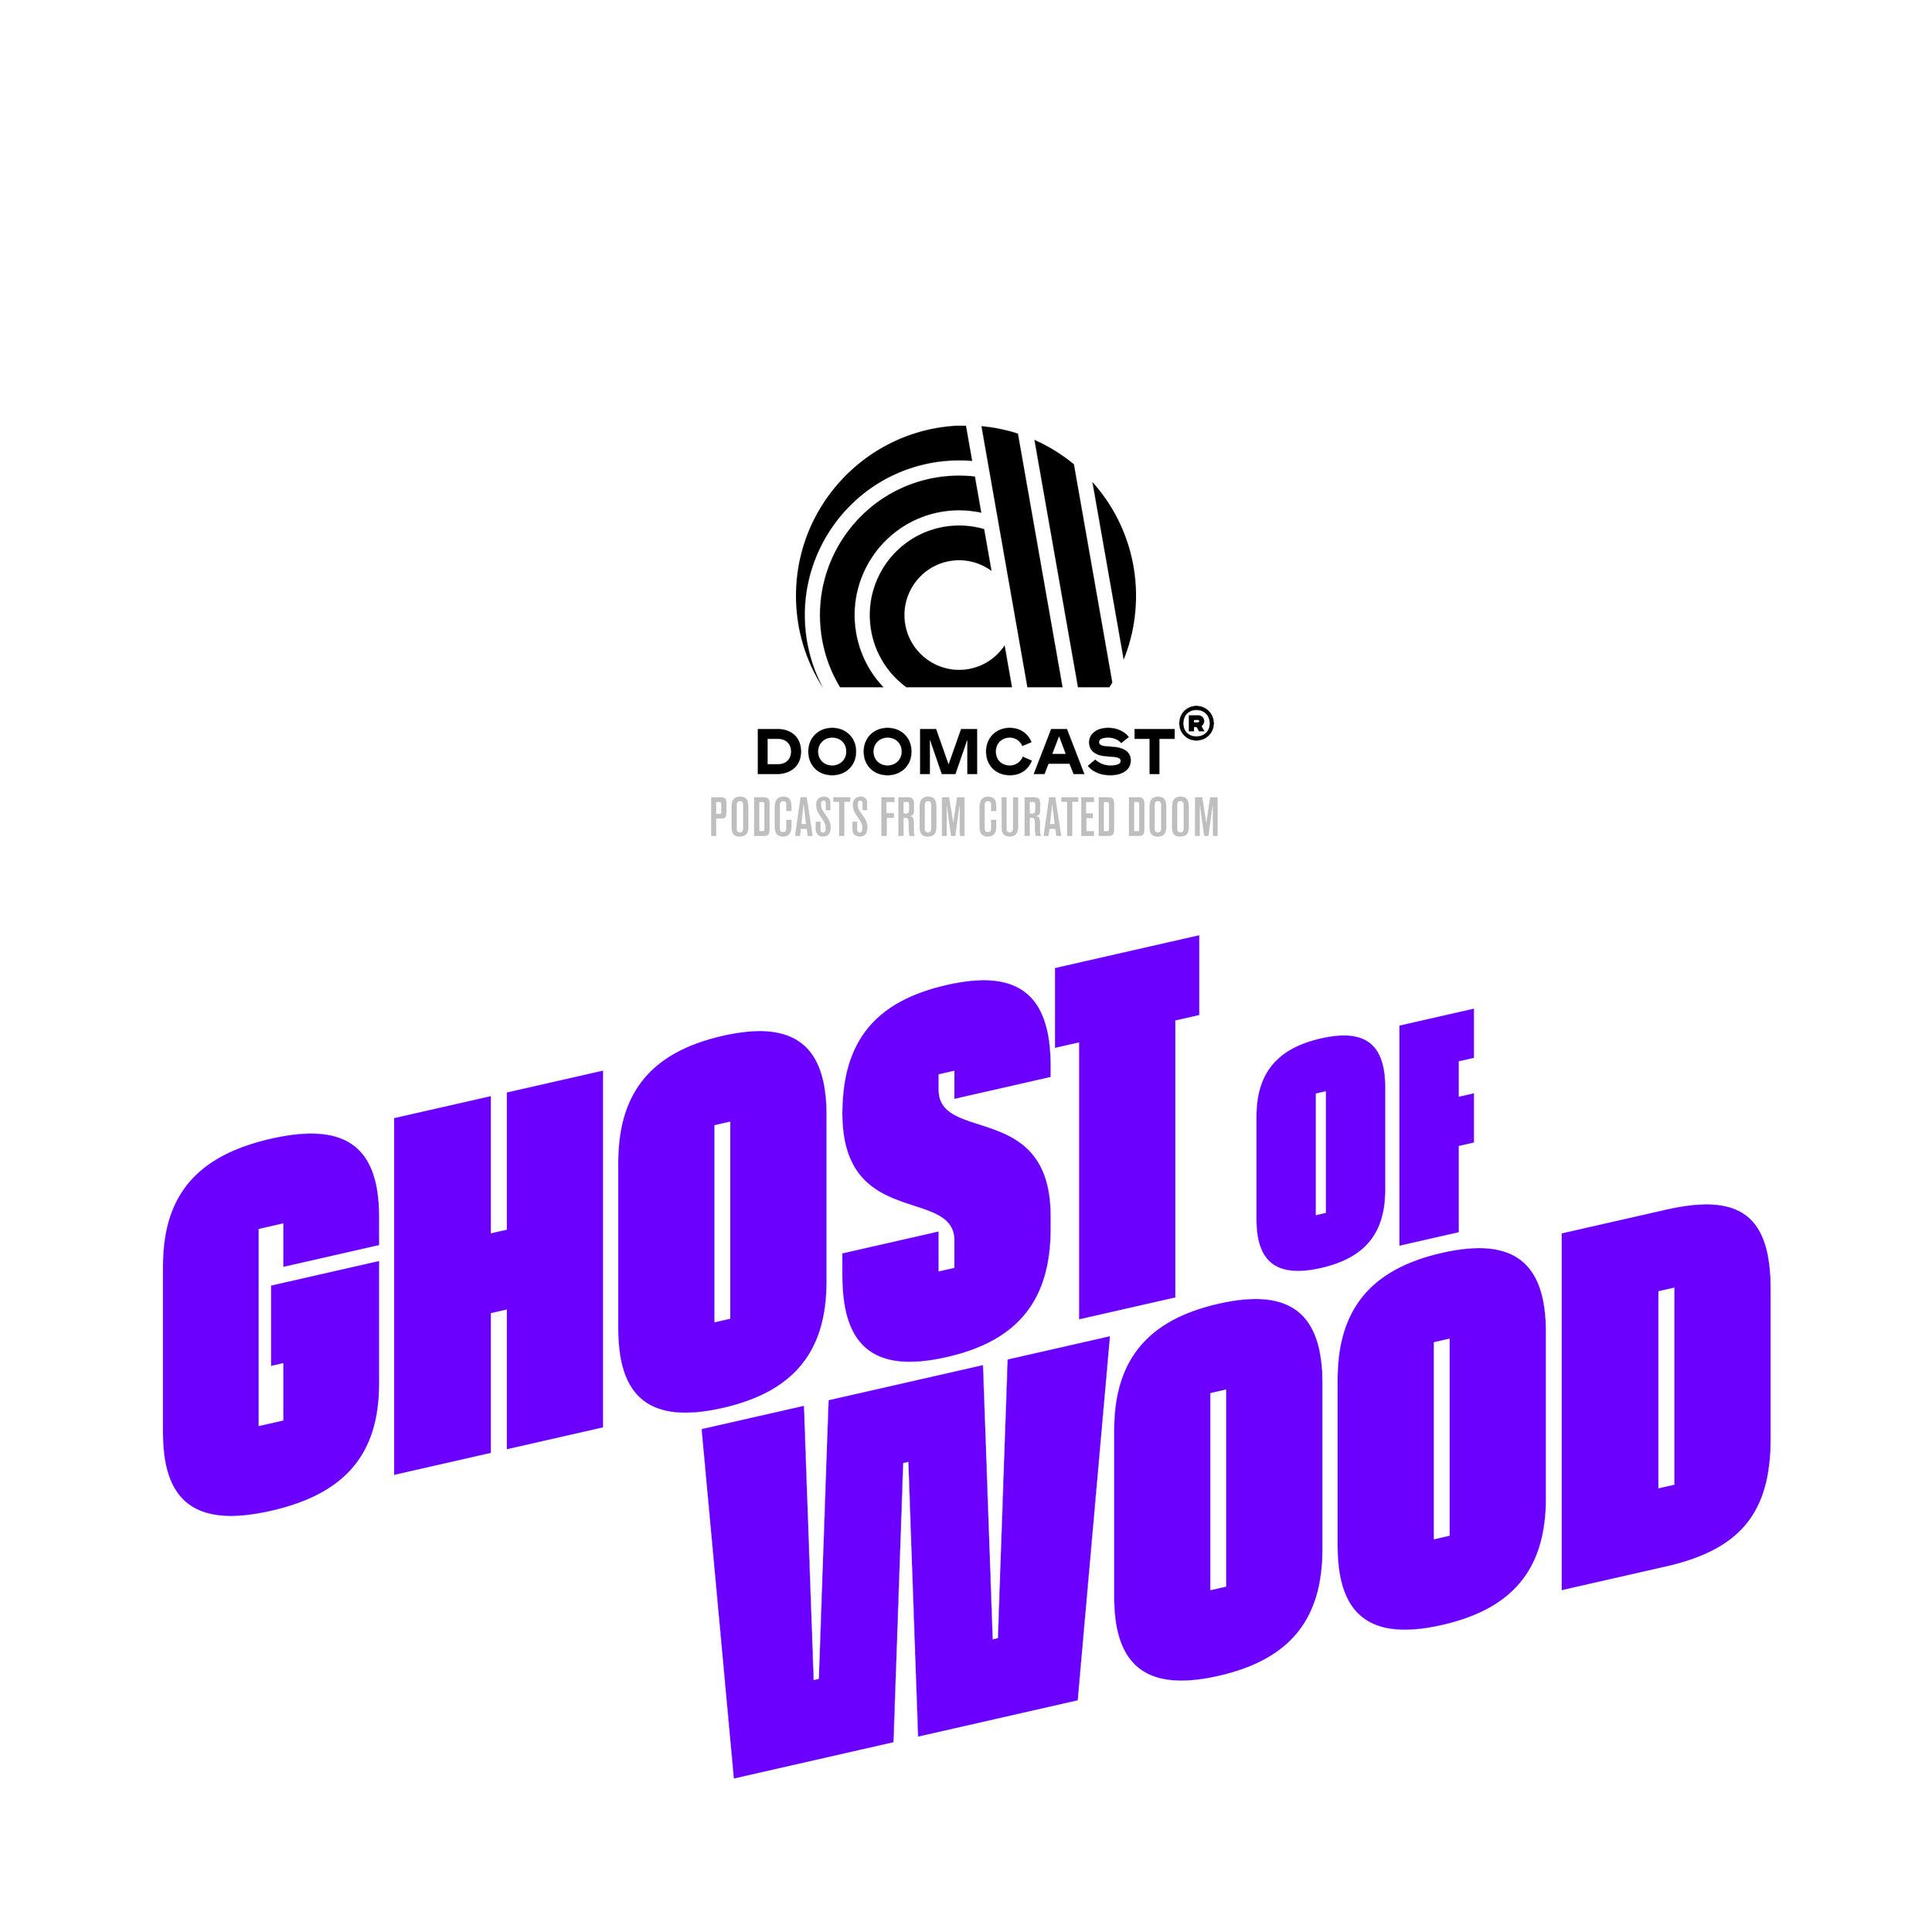 DOOMCAST-Ghost of Wood_Promo01.jpg